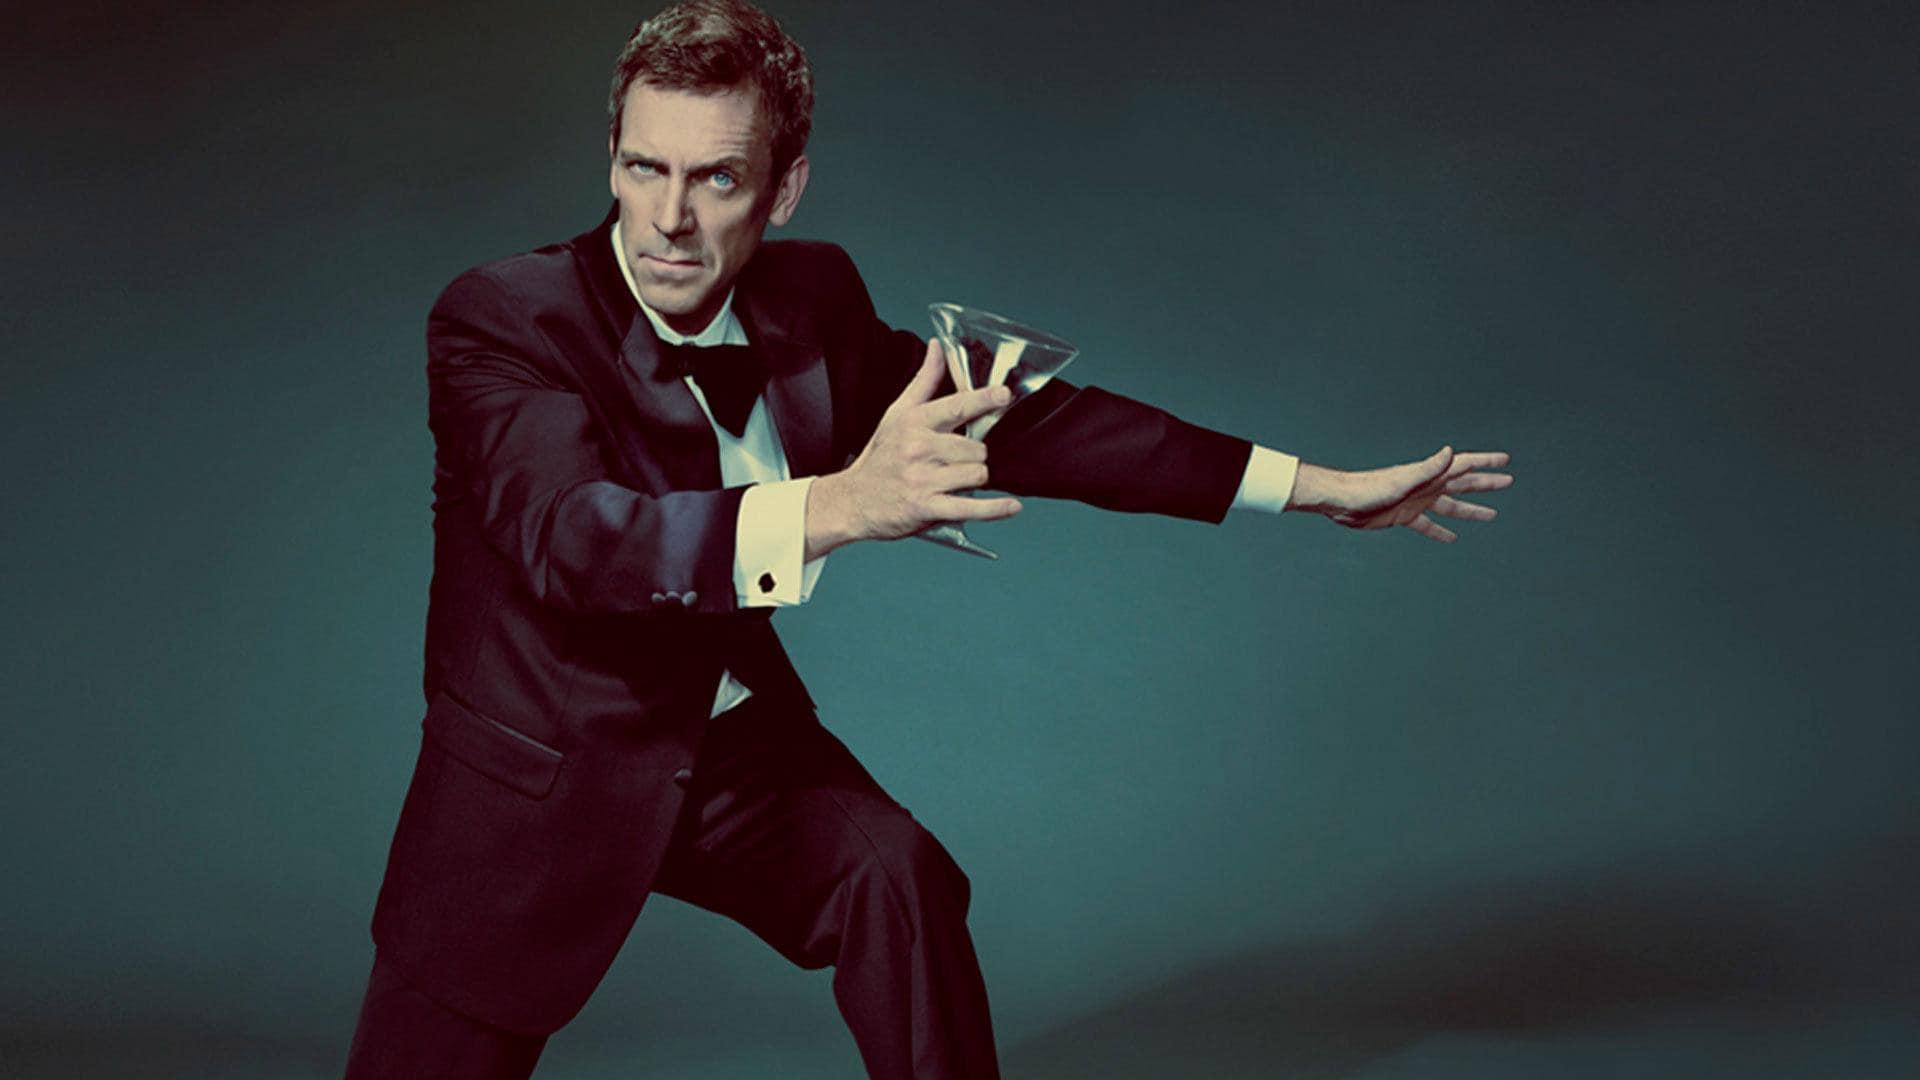 Hugh Laurie: December 13, 2008